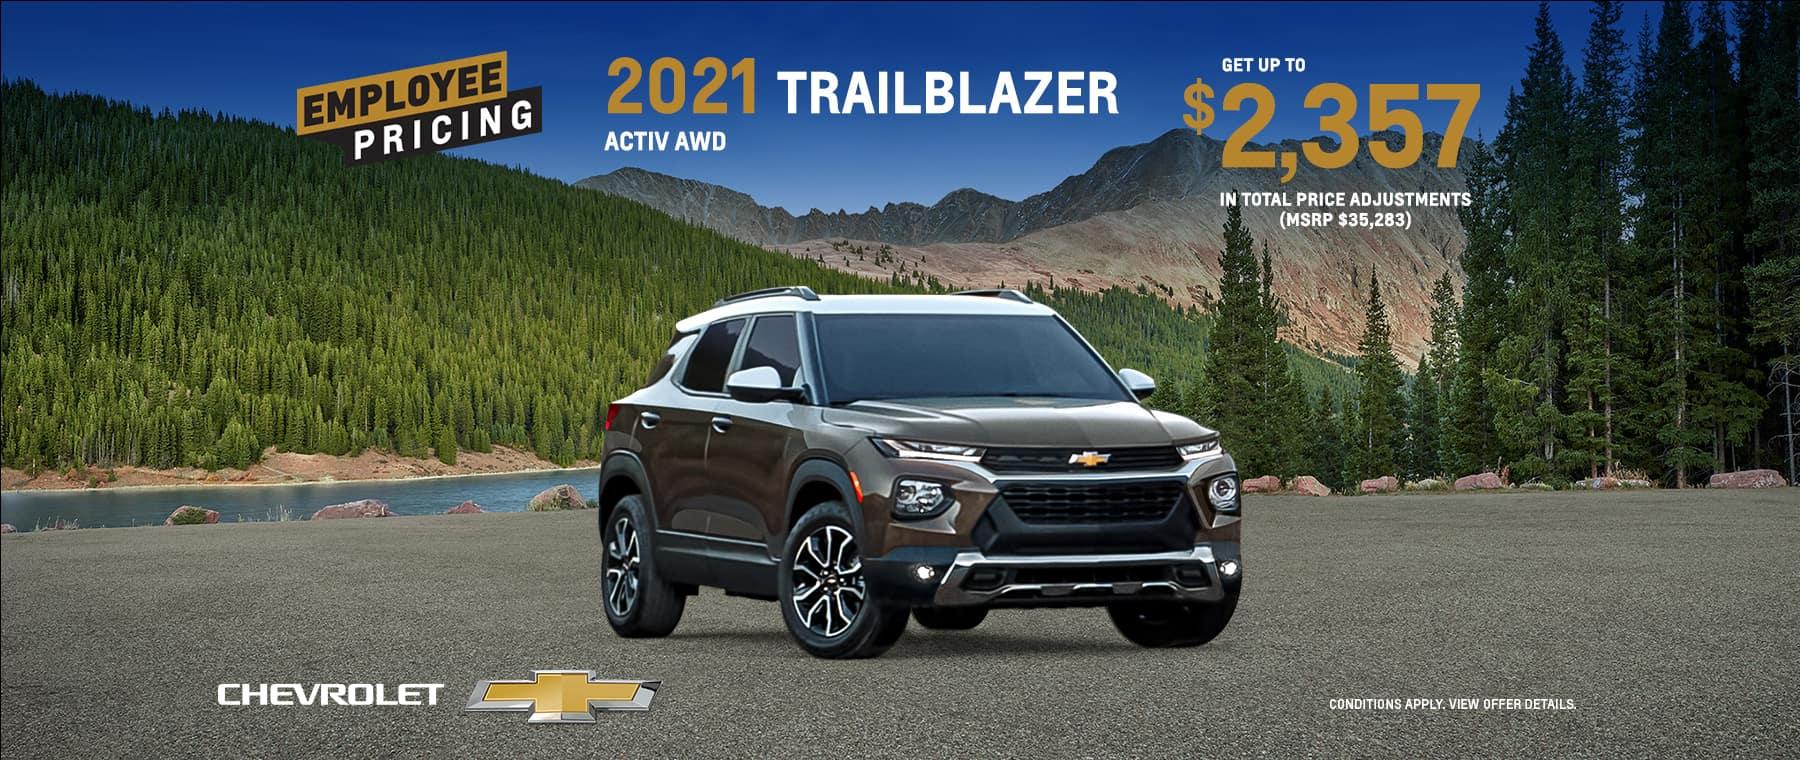 2021_JUNE_WST_Chevy_T3_EN_1800x760_CAR-SUV_TRAILBLAZER